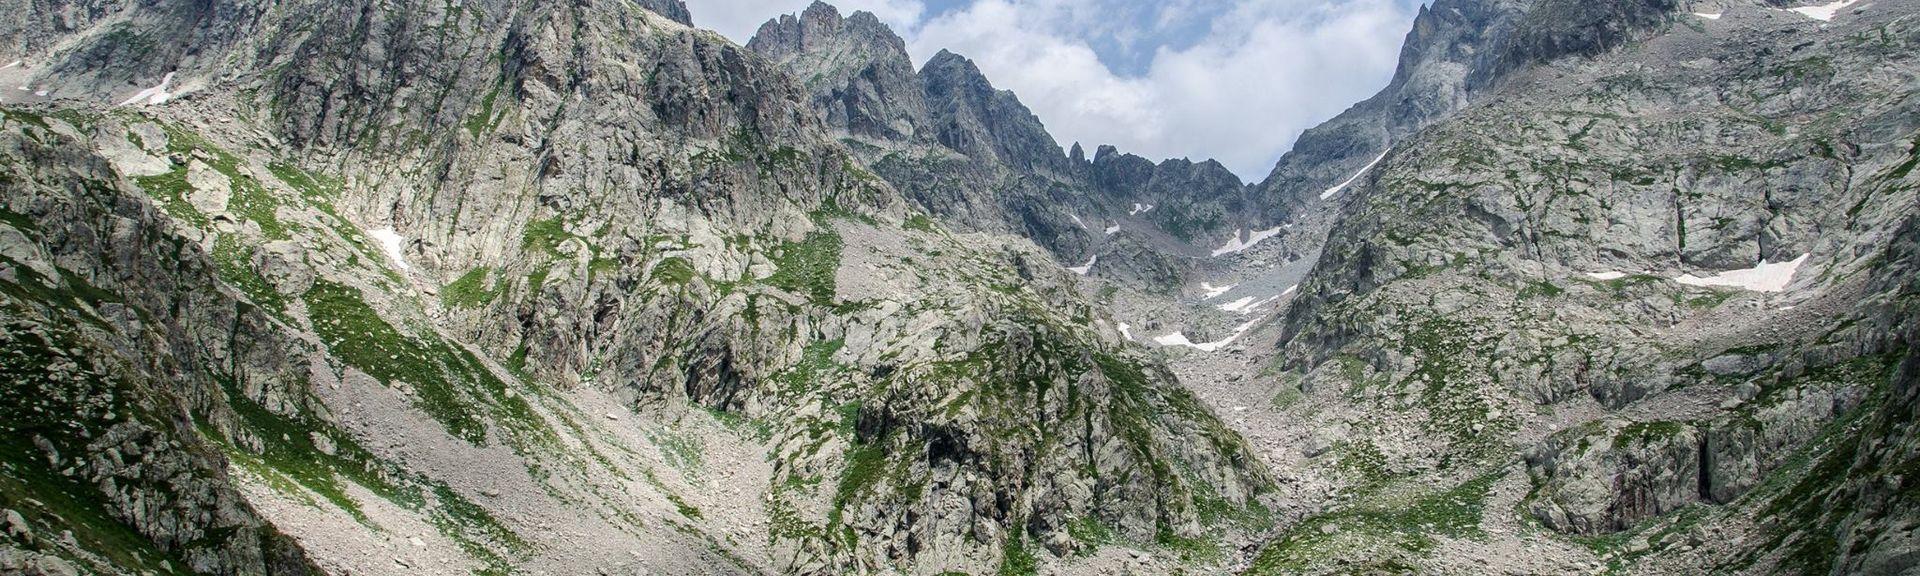 Belvedere, Alpes-Maritimes, Frankrijk